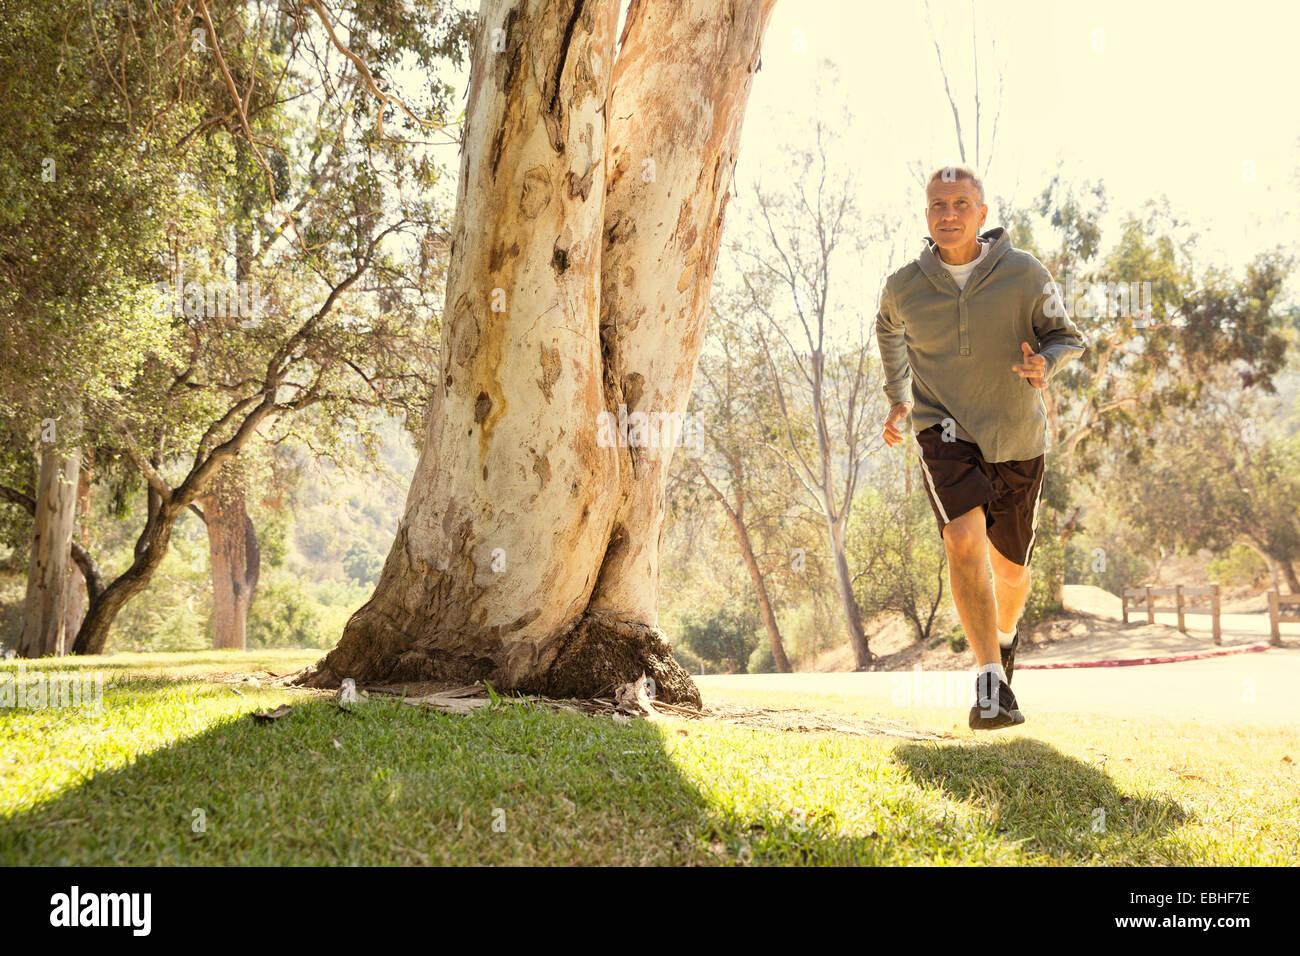 Mature man running through park - Stock Image